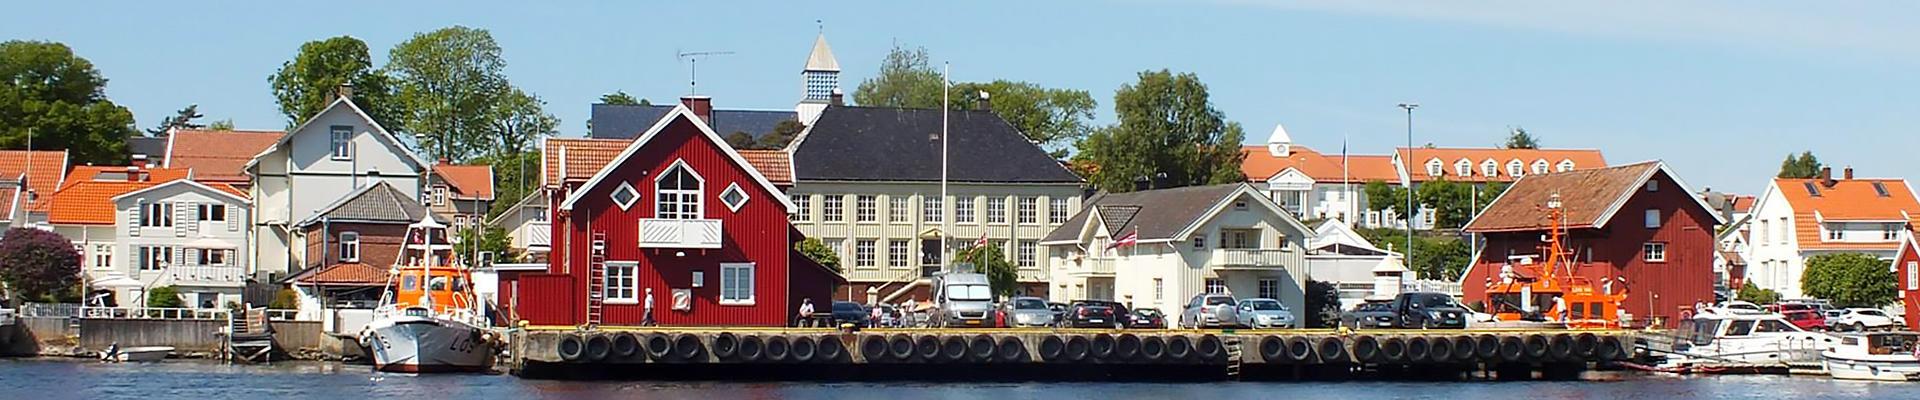 FO Telemark